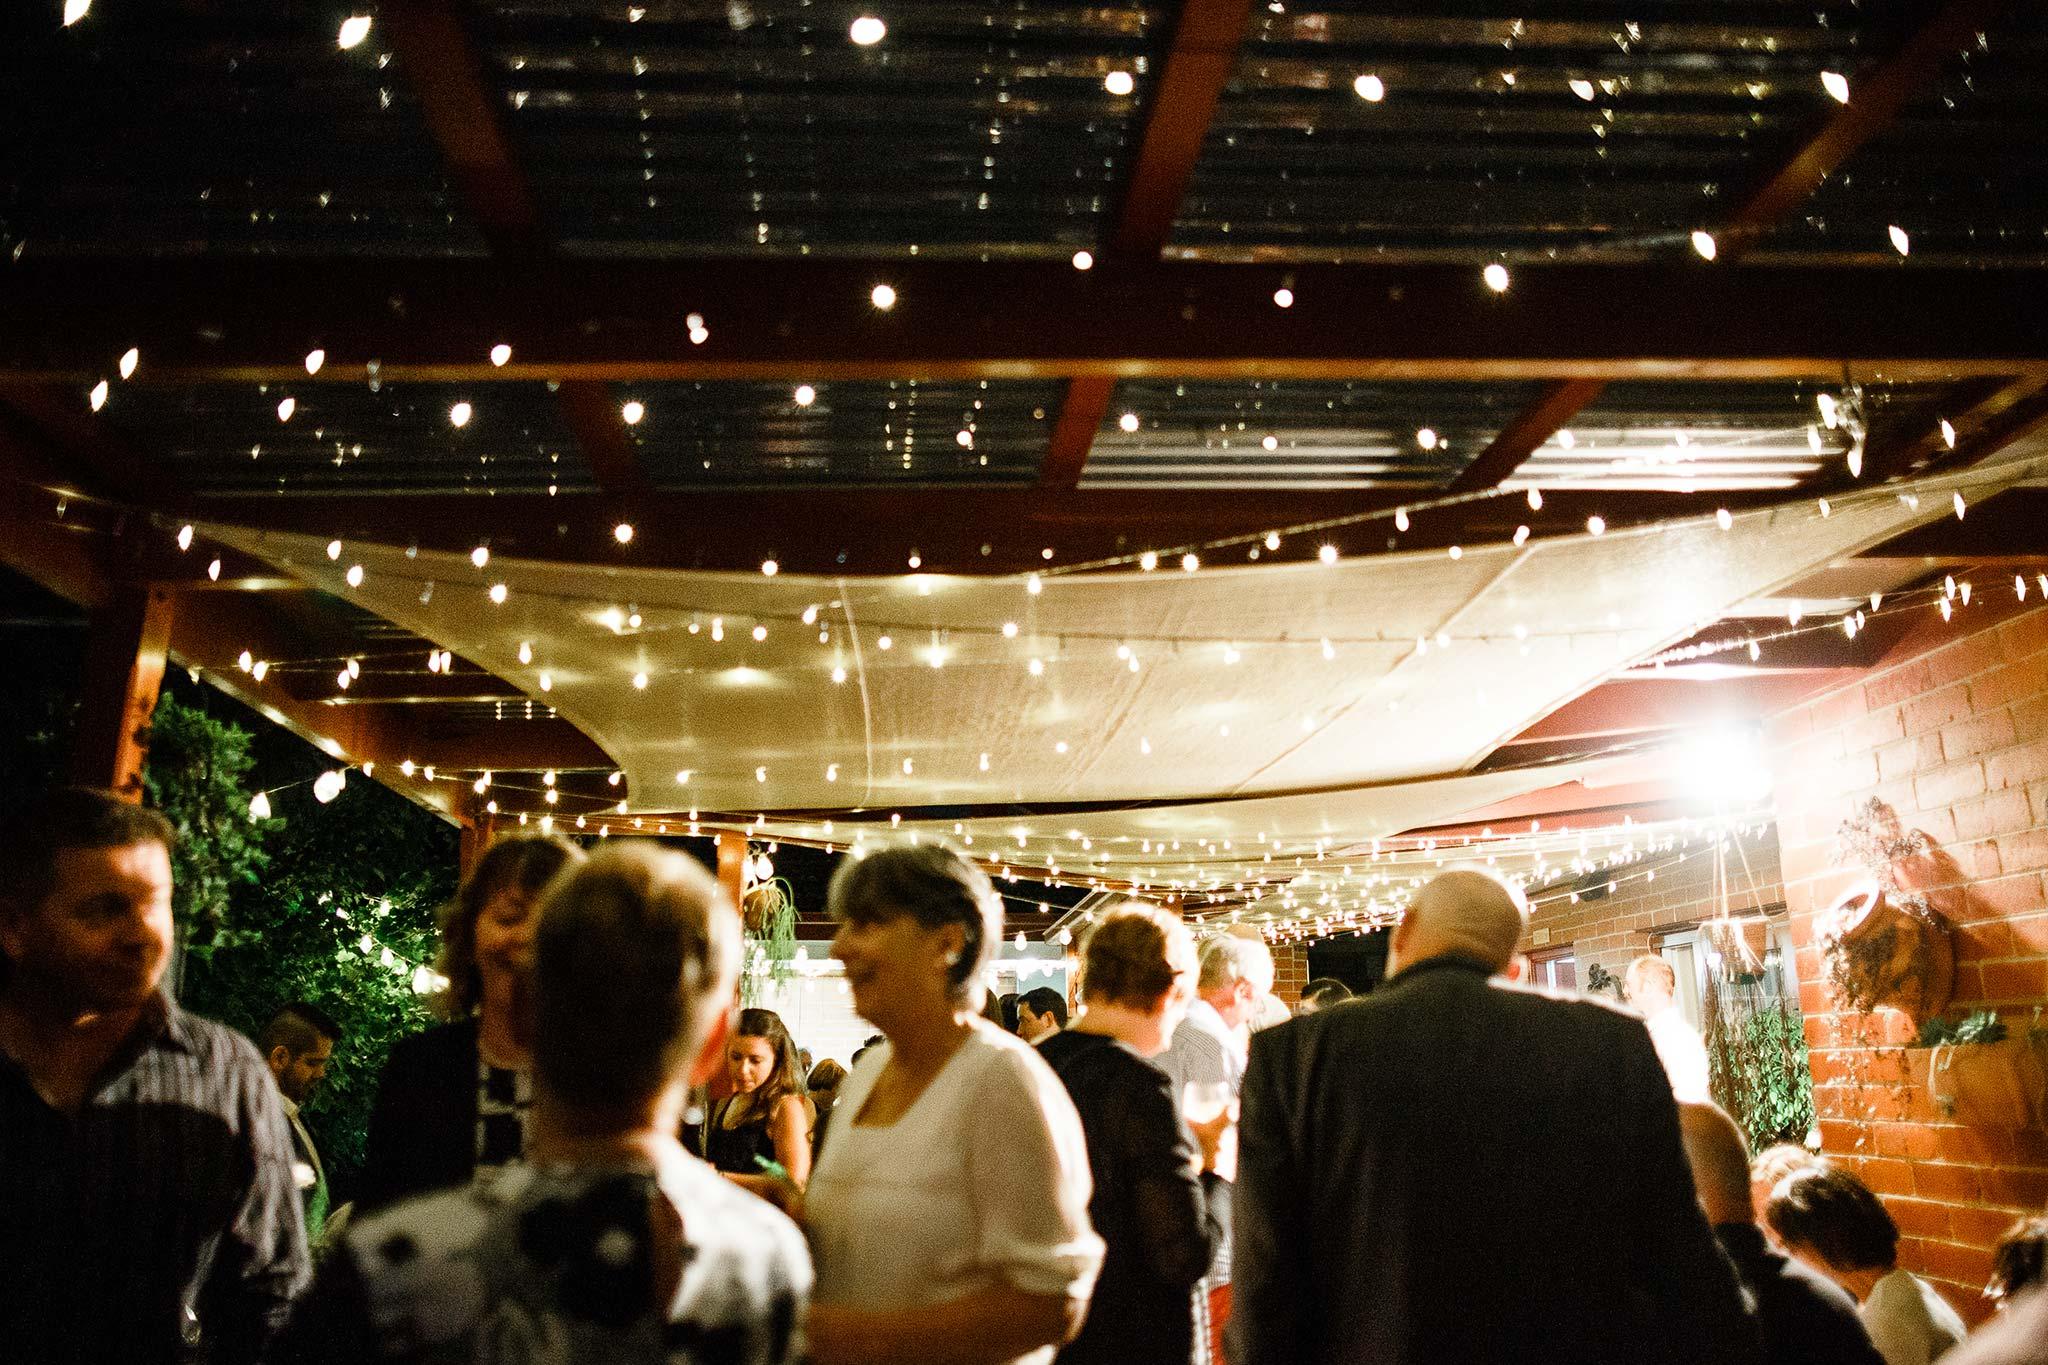 Strathmore-Melbourne-Backyard-Wedding-reception-decorations